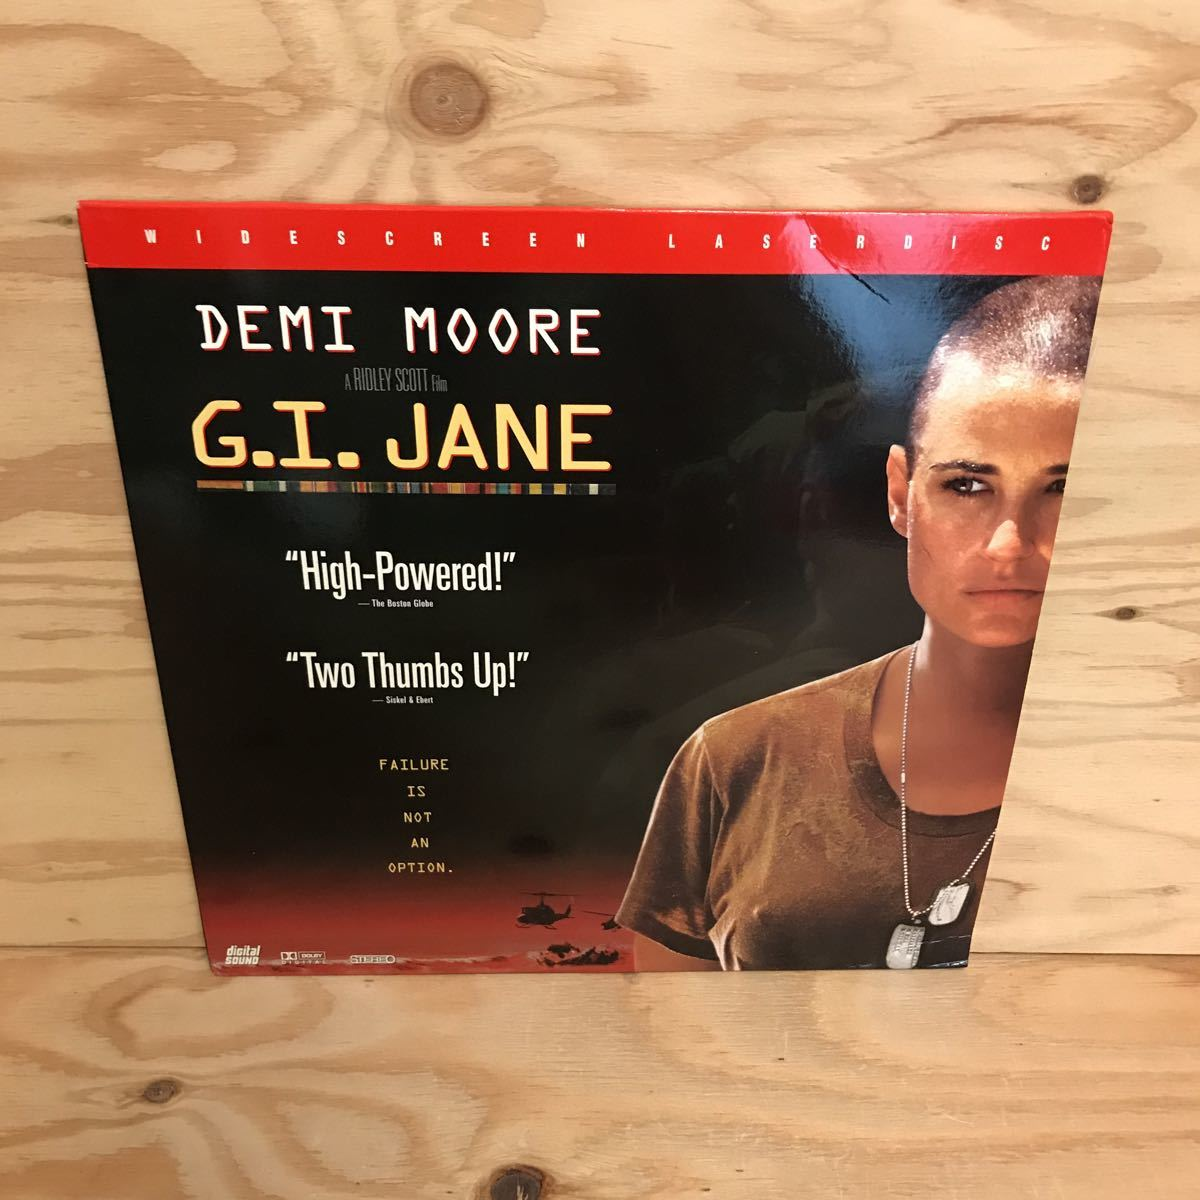 ◎K3FIID-200305 レア[G.I.JANE]LD レーザーディスク SCOTT FREE デミ・ムーア_画像1